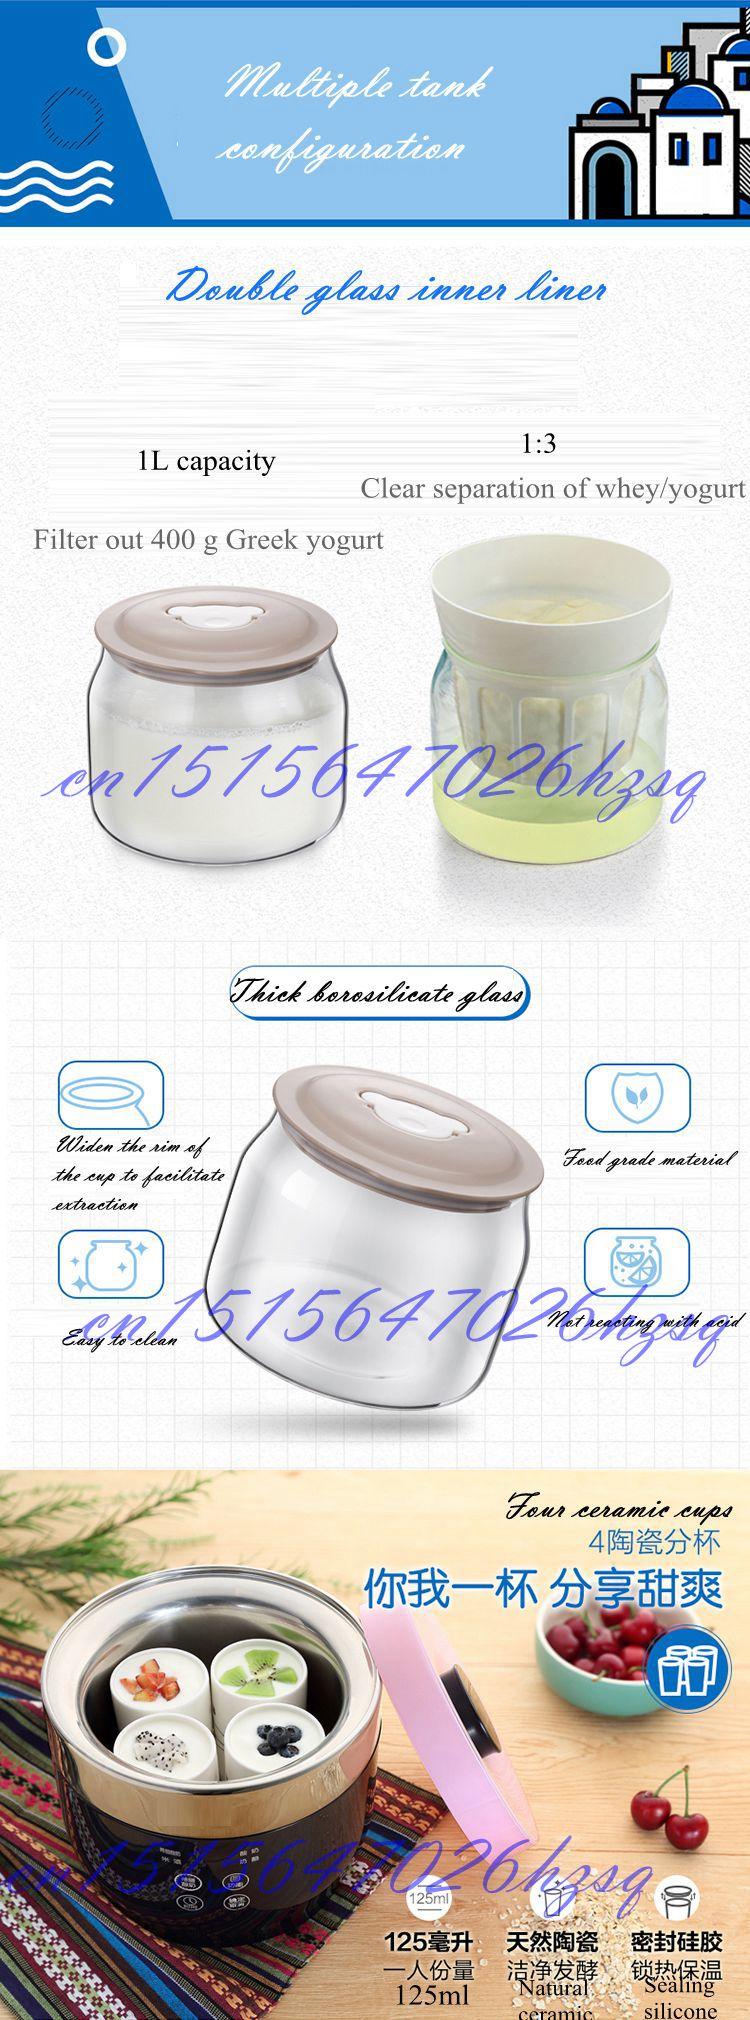 DMWD Microcomputer Greek yogurt maker Four cups yourt Multifunctional For Rice wine/yogurt/cheese 20W Stainless steel liner